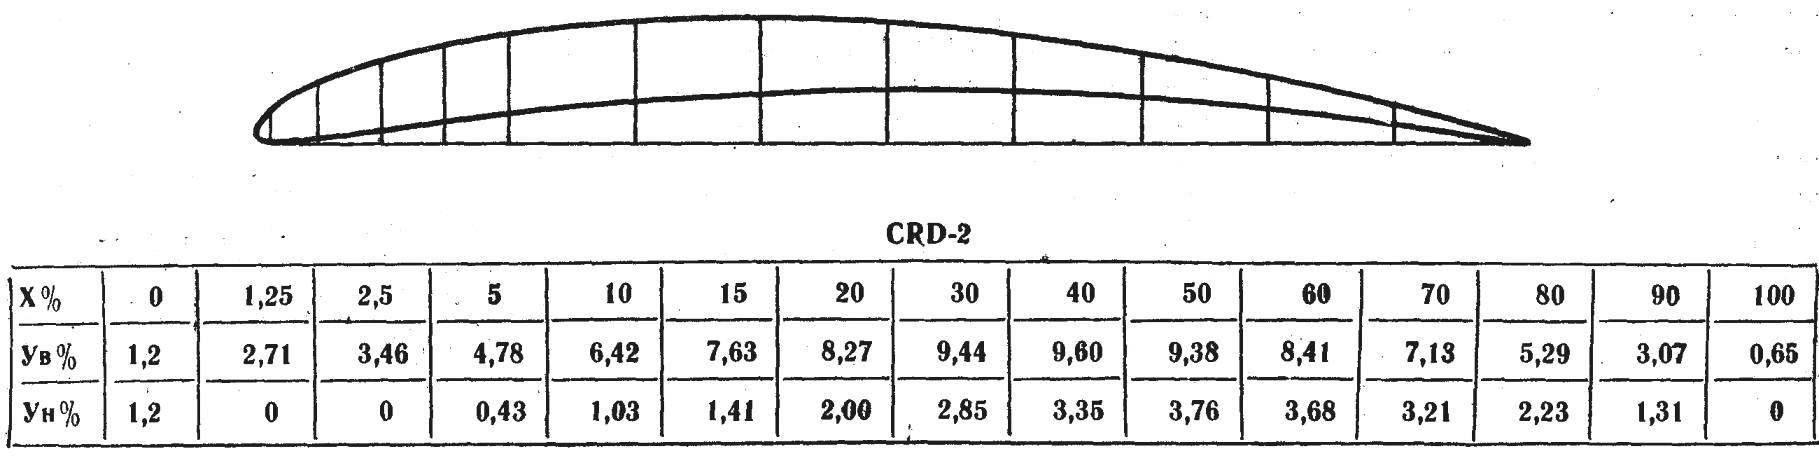 CRD-2